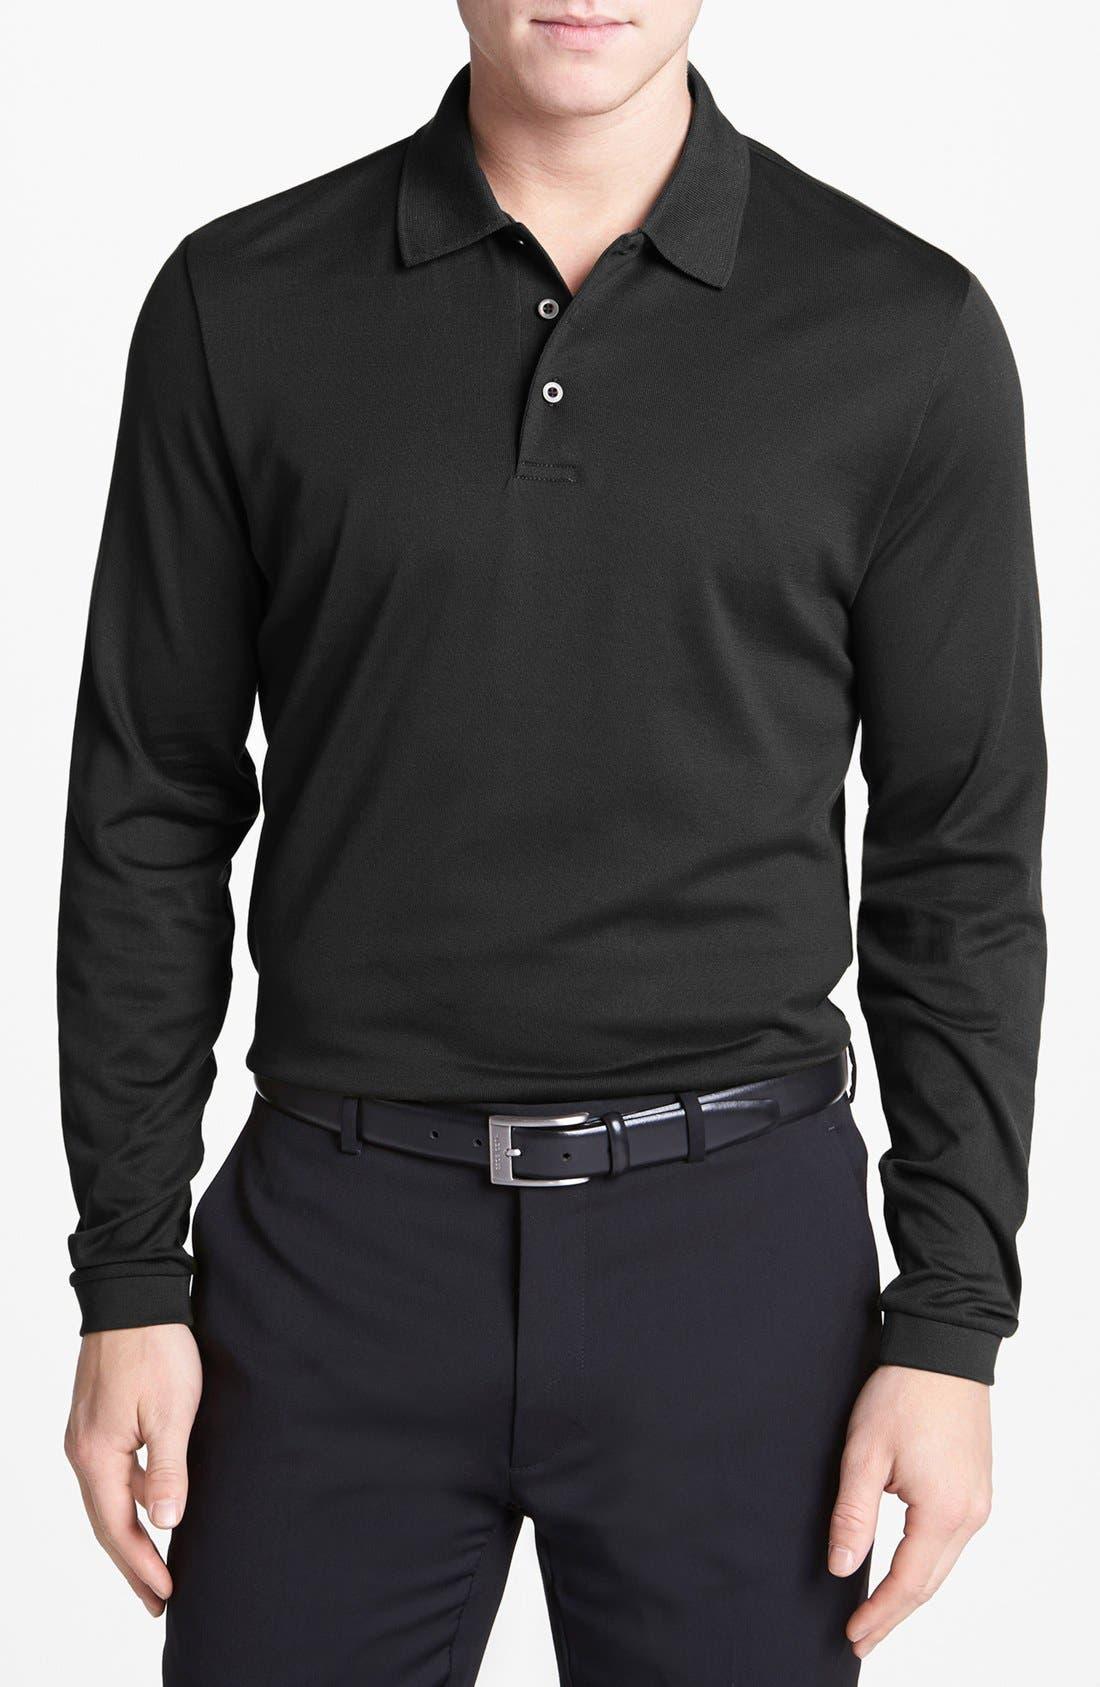 Main Image - Robert Barakett 'Palermo' Long Sleeve Jersey Polo